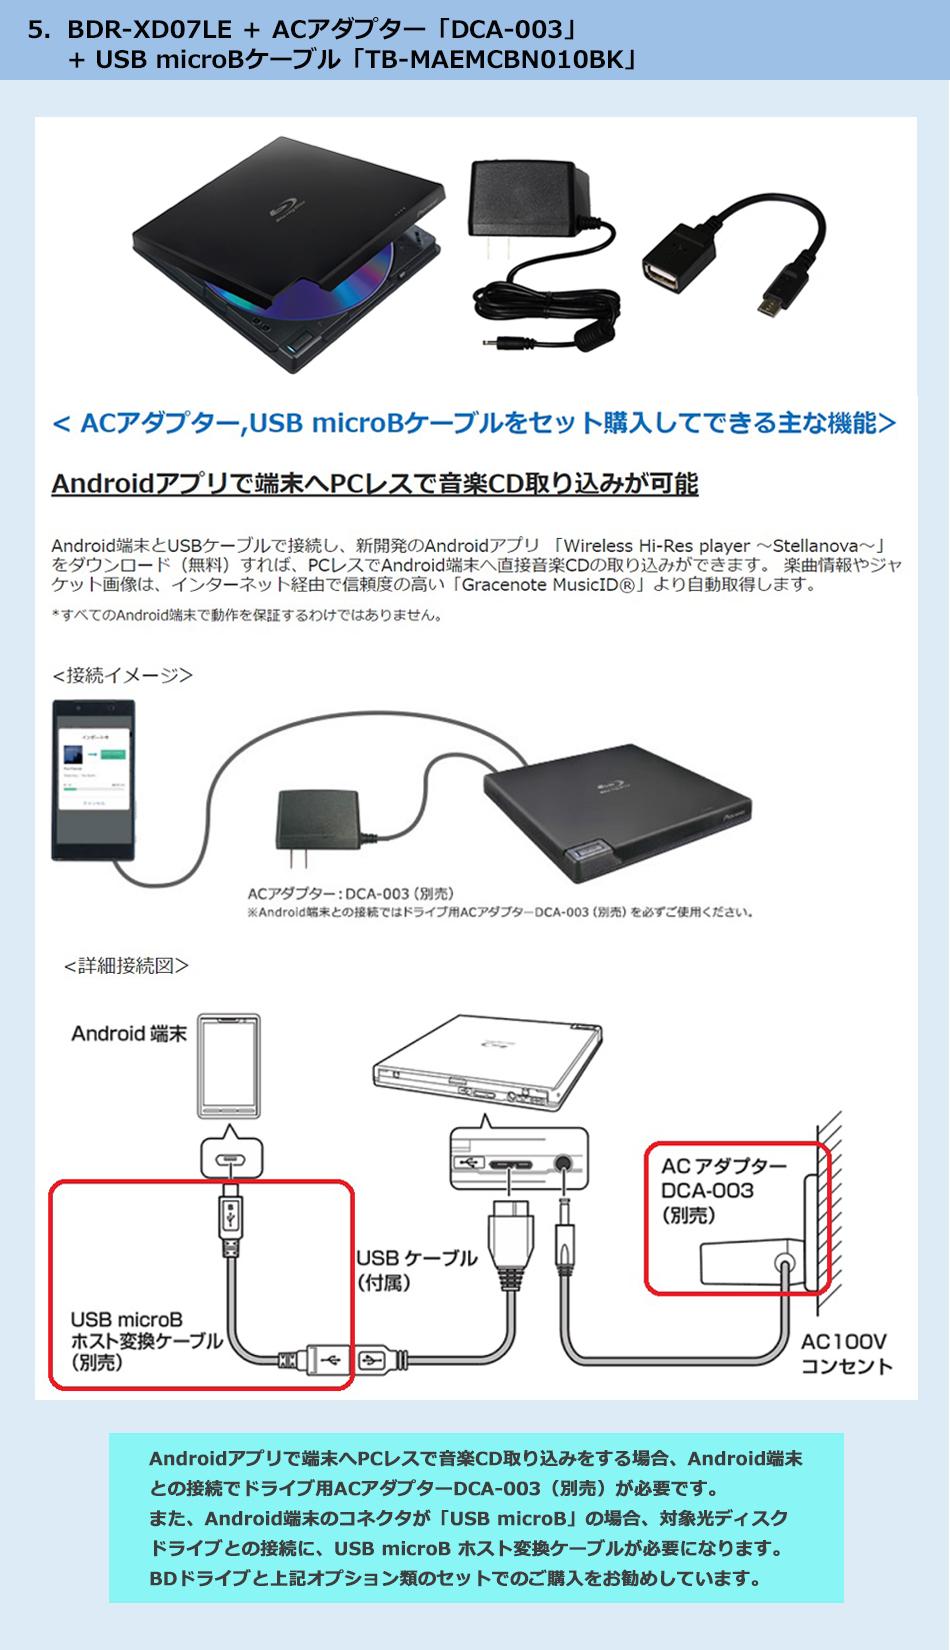 5.BDR-XD07LE+ACアダプター「DCA-003」+USB microBケーブル「TB-MAEMCBN010BK」セットのご紹介